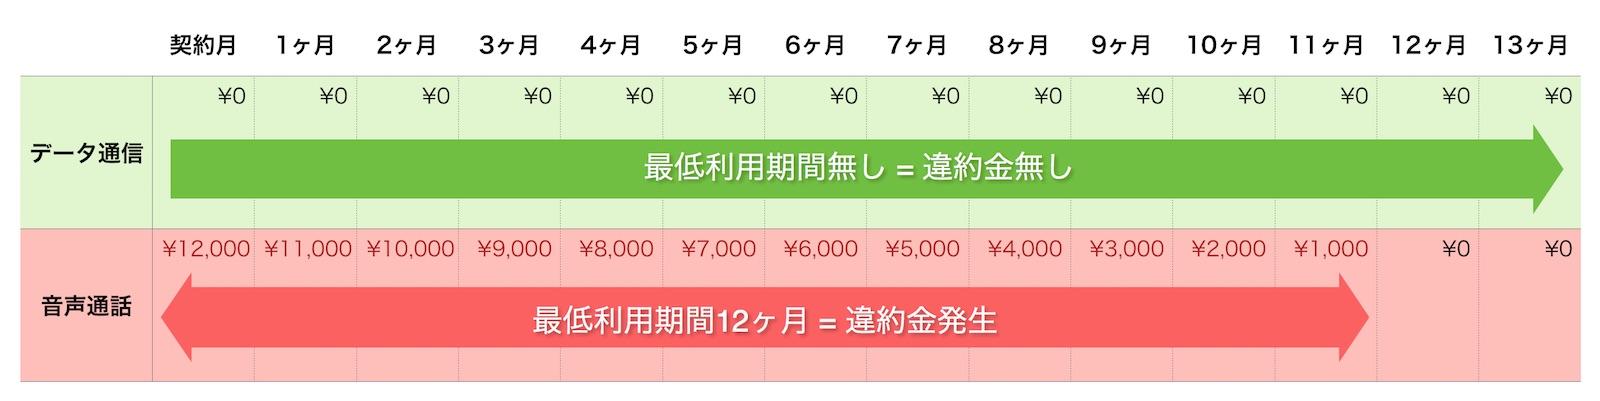 nuroモバイル 最低利用期間と契約解除料